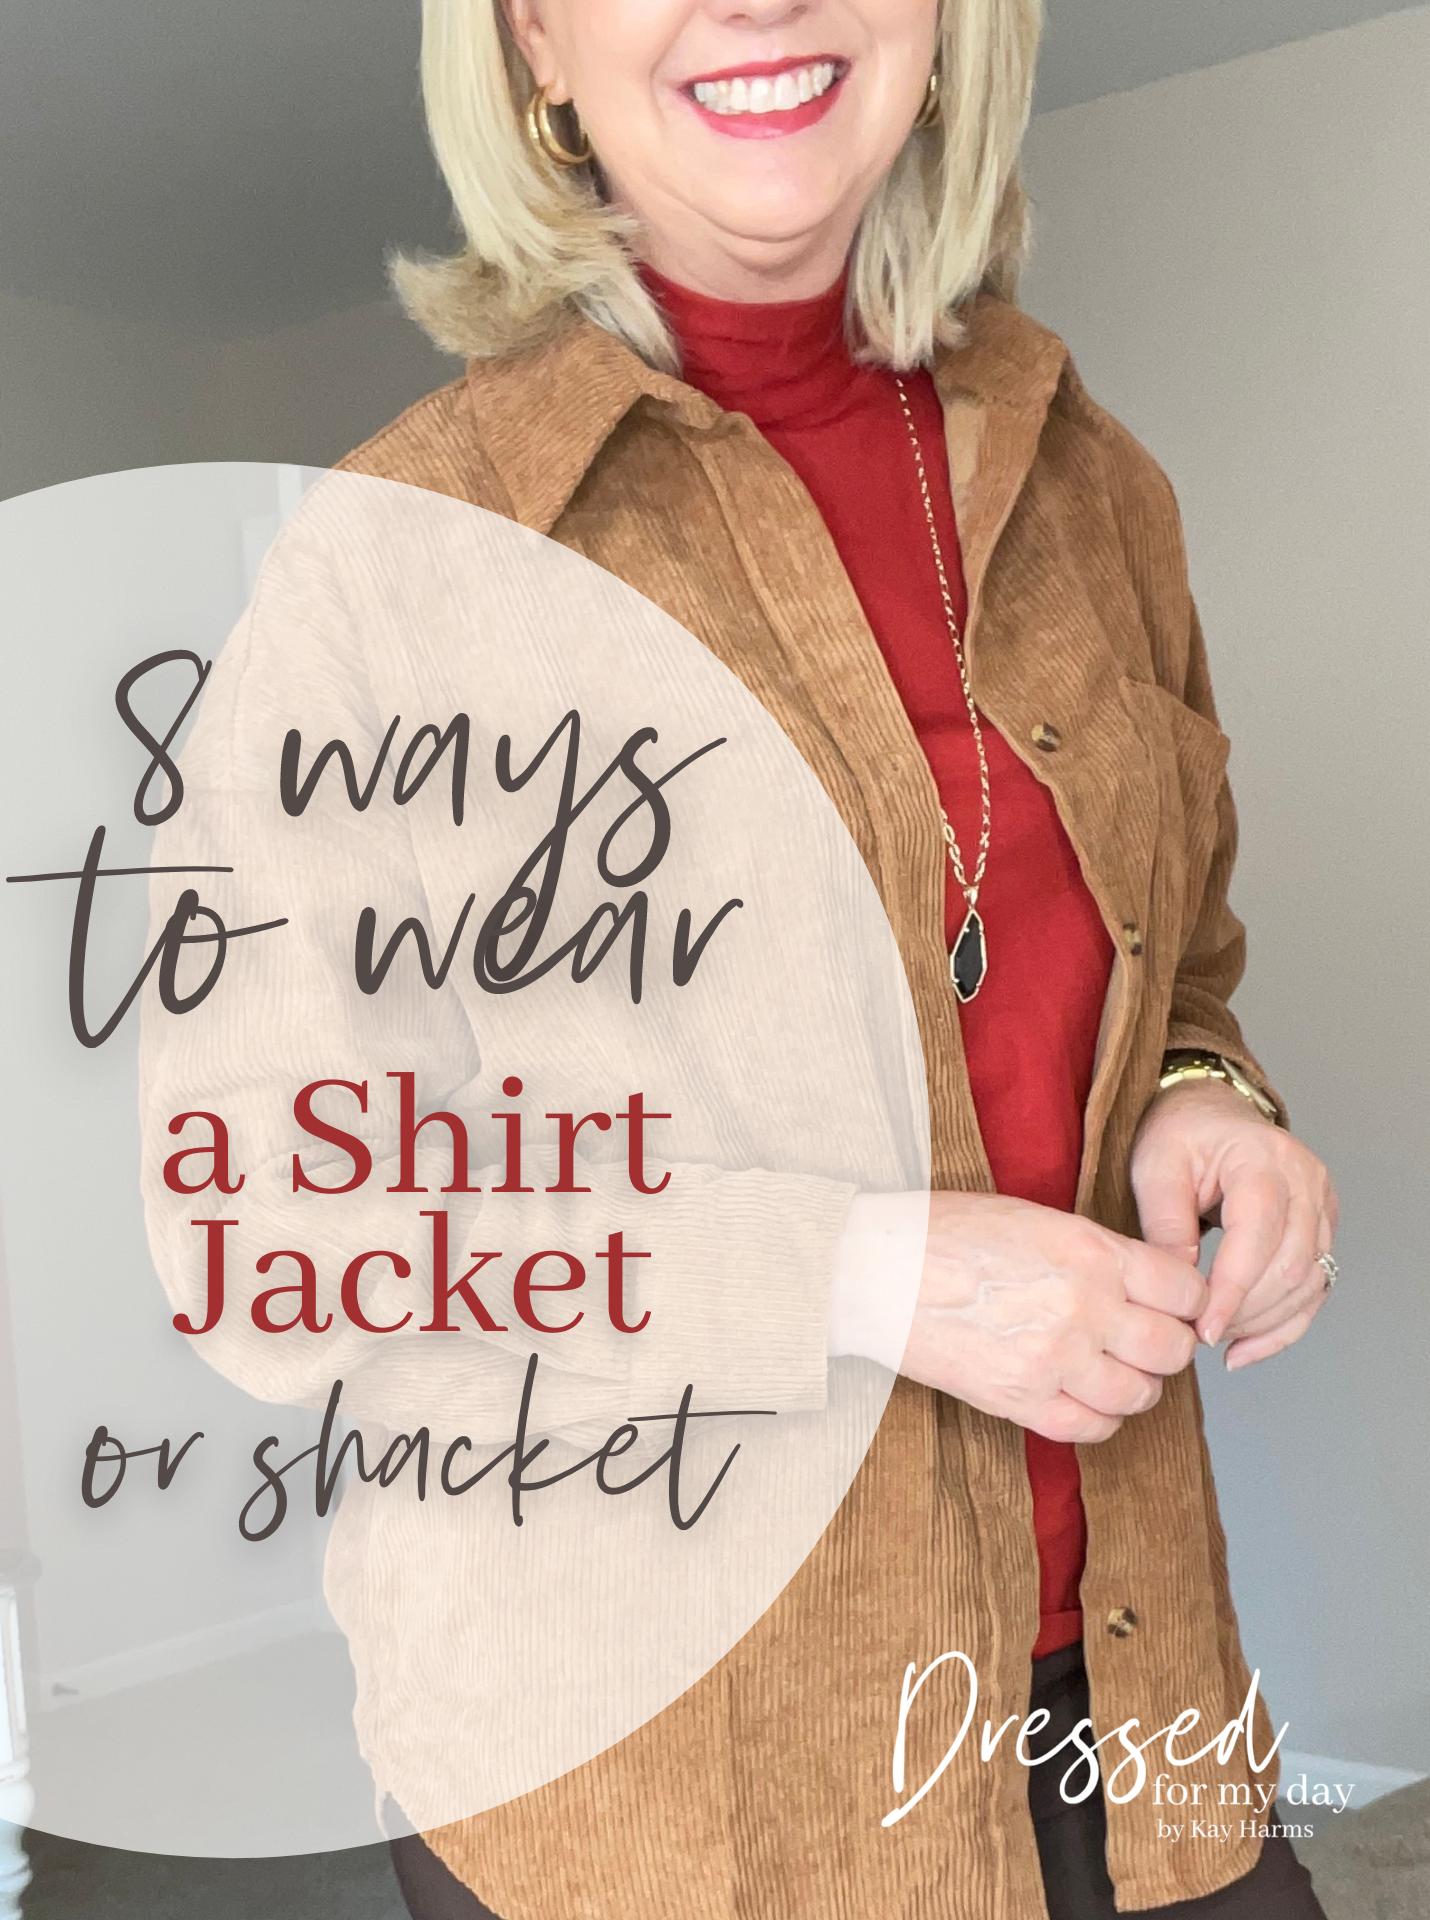 8 Ways to Wear a Shirt Jacket